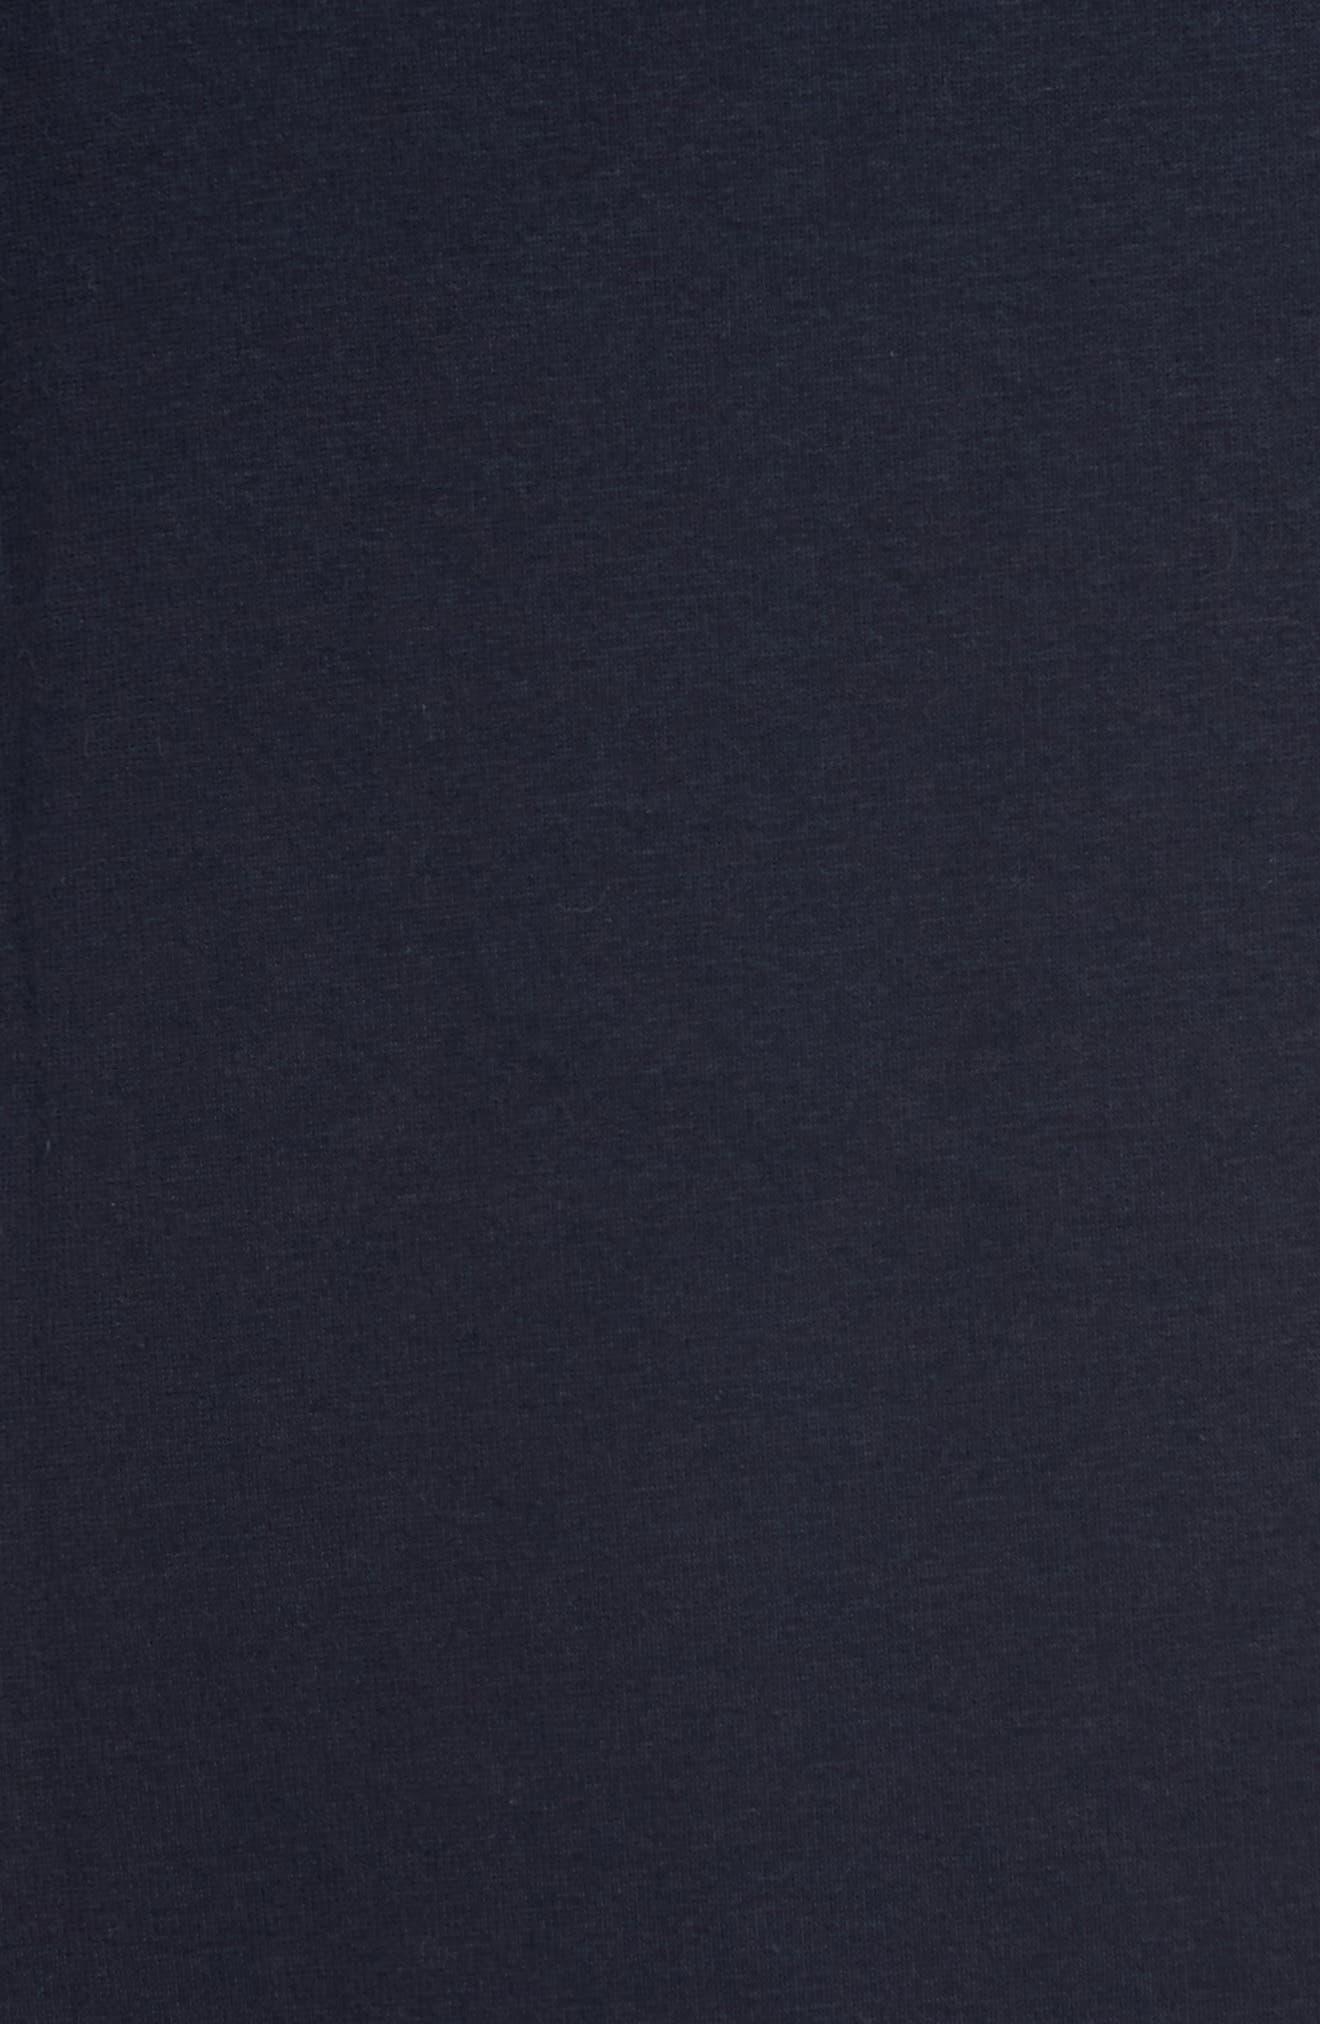 Jersey Fleece Robe,                             Alternate thumbnail 5, color,                             Navy